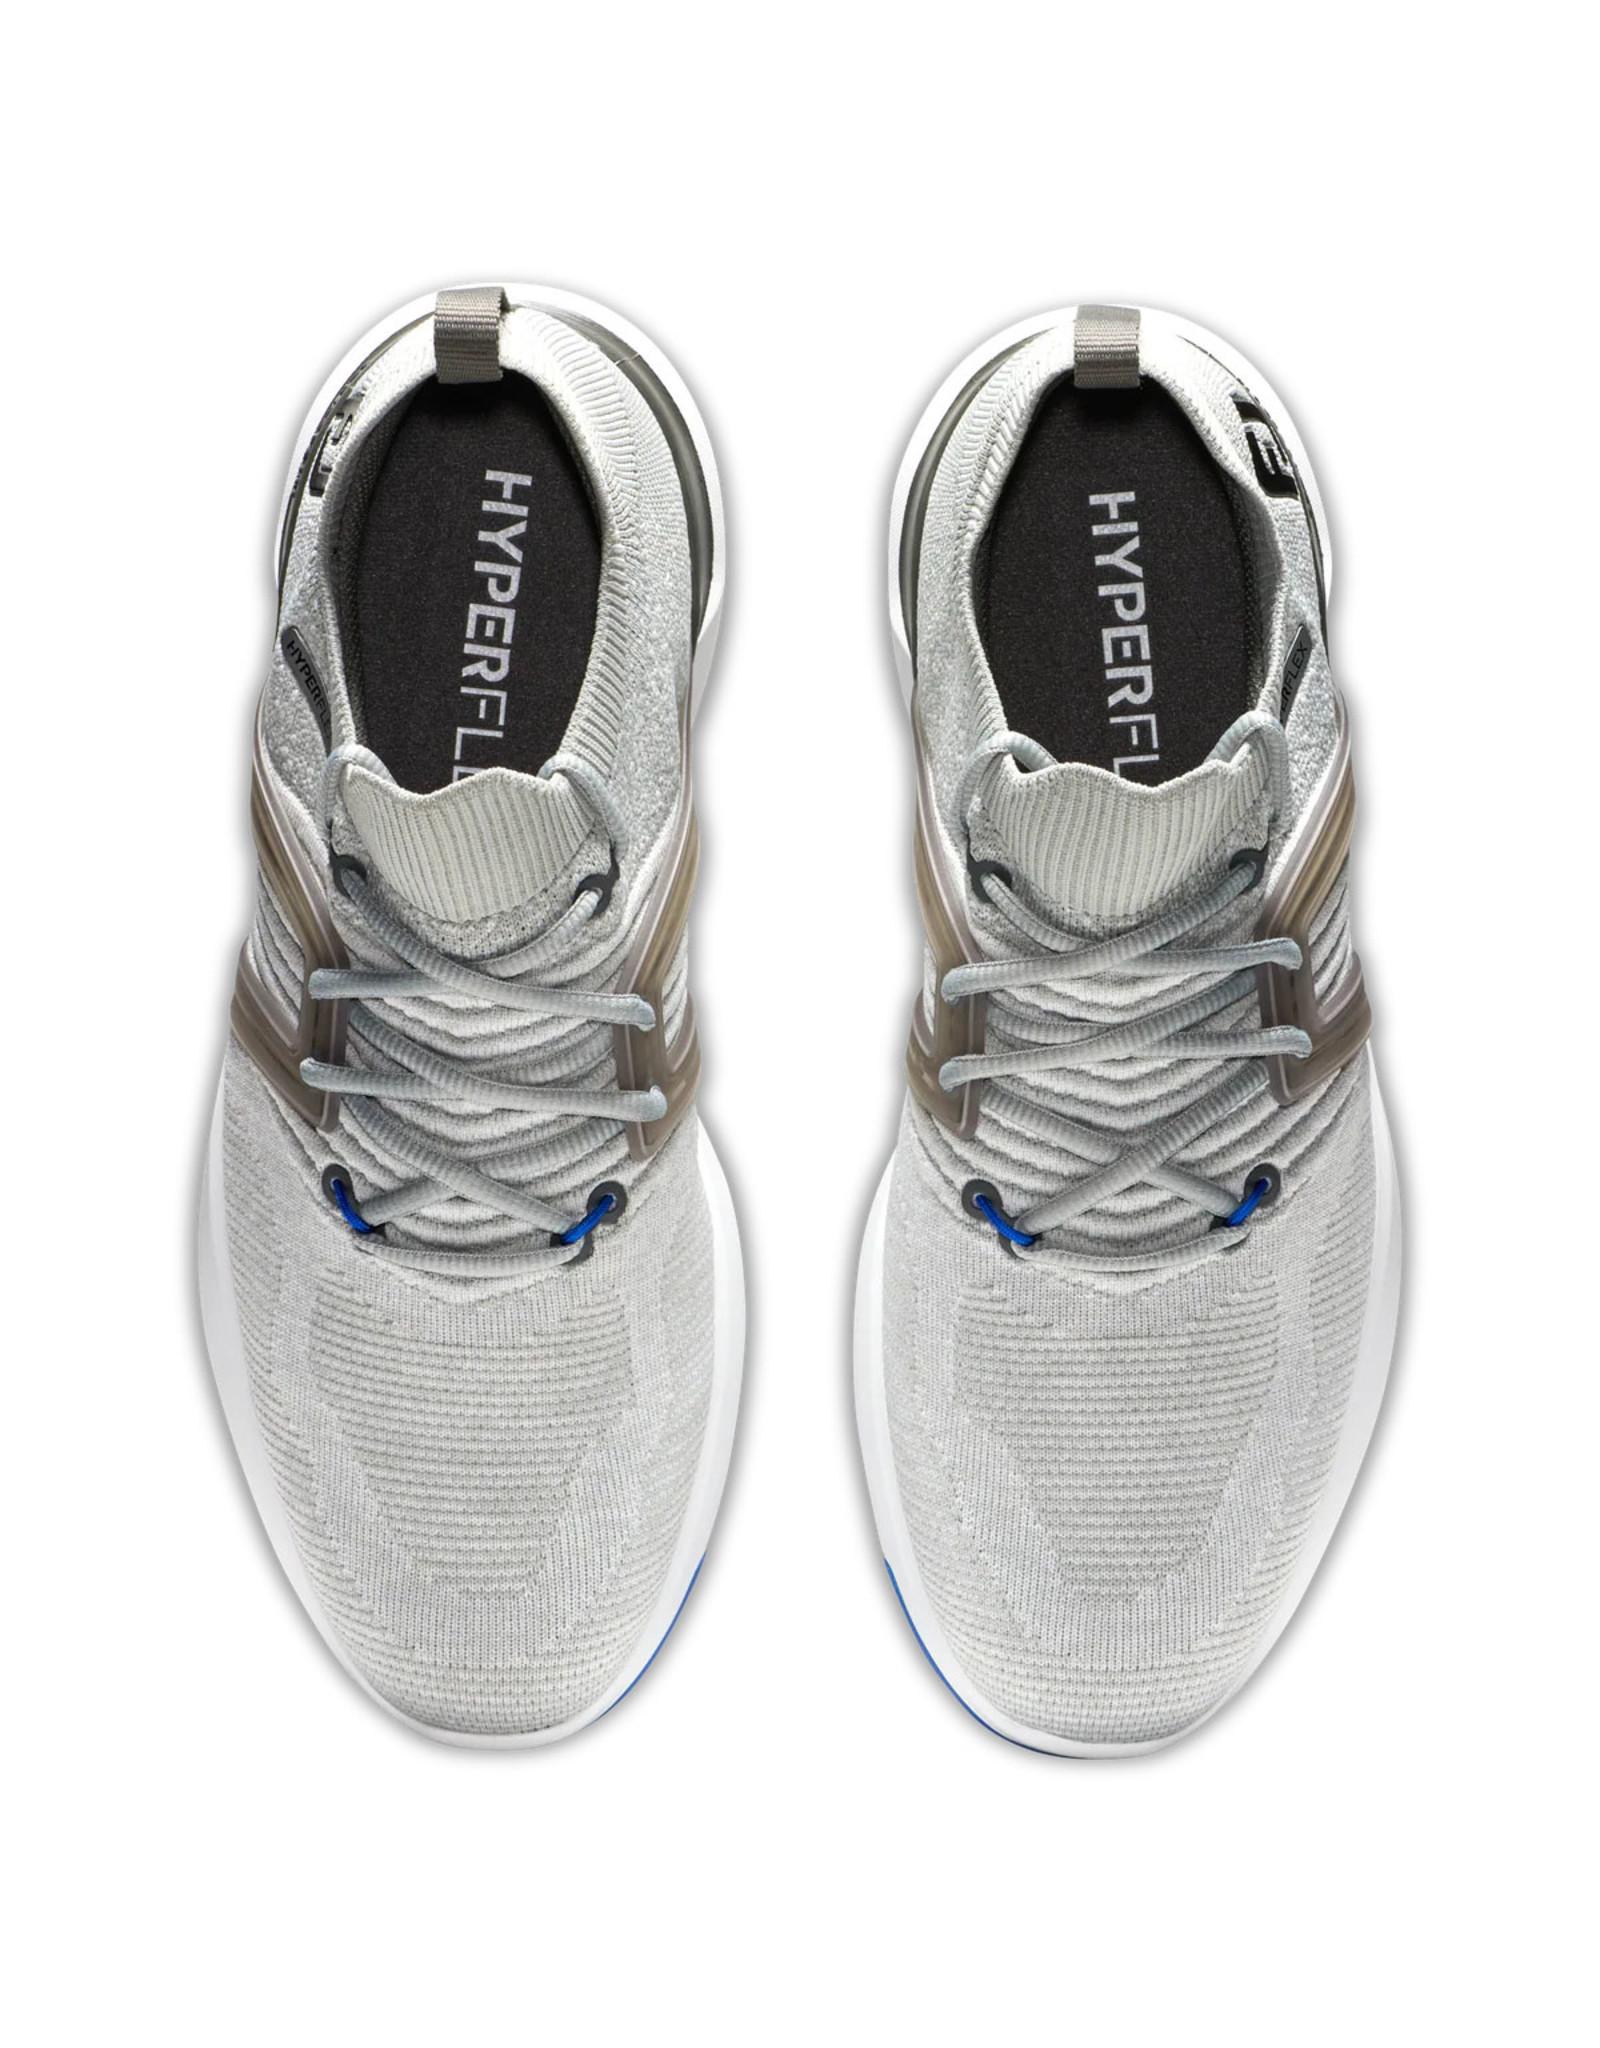 FootJoy FootJoy Hyperflex Gray/White/Blue